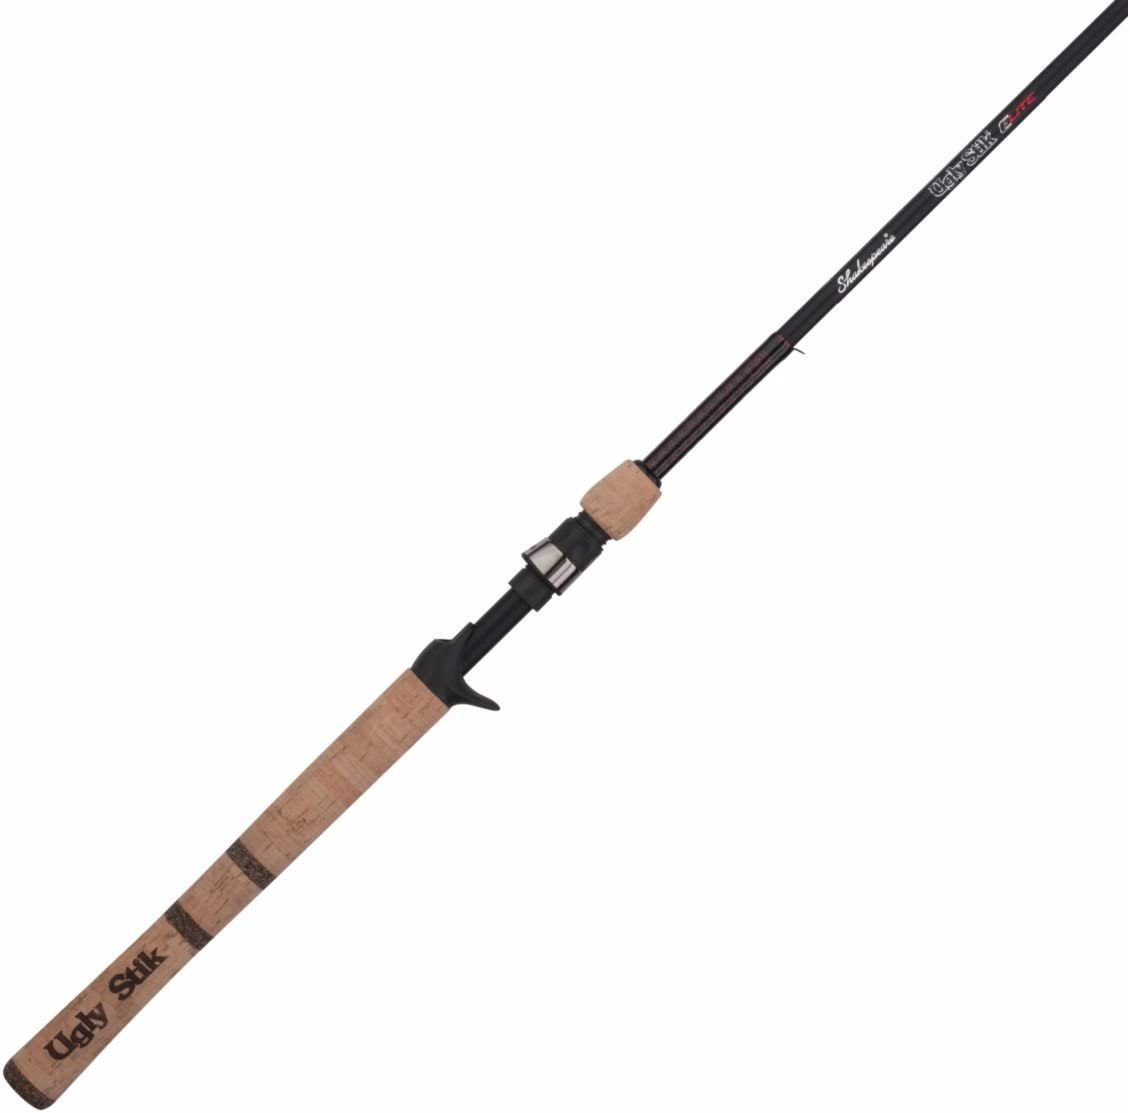 Ugly Stik Elite Casting Fishing Rod